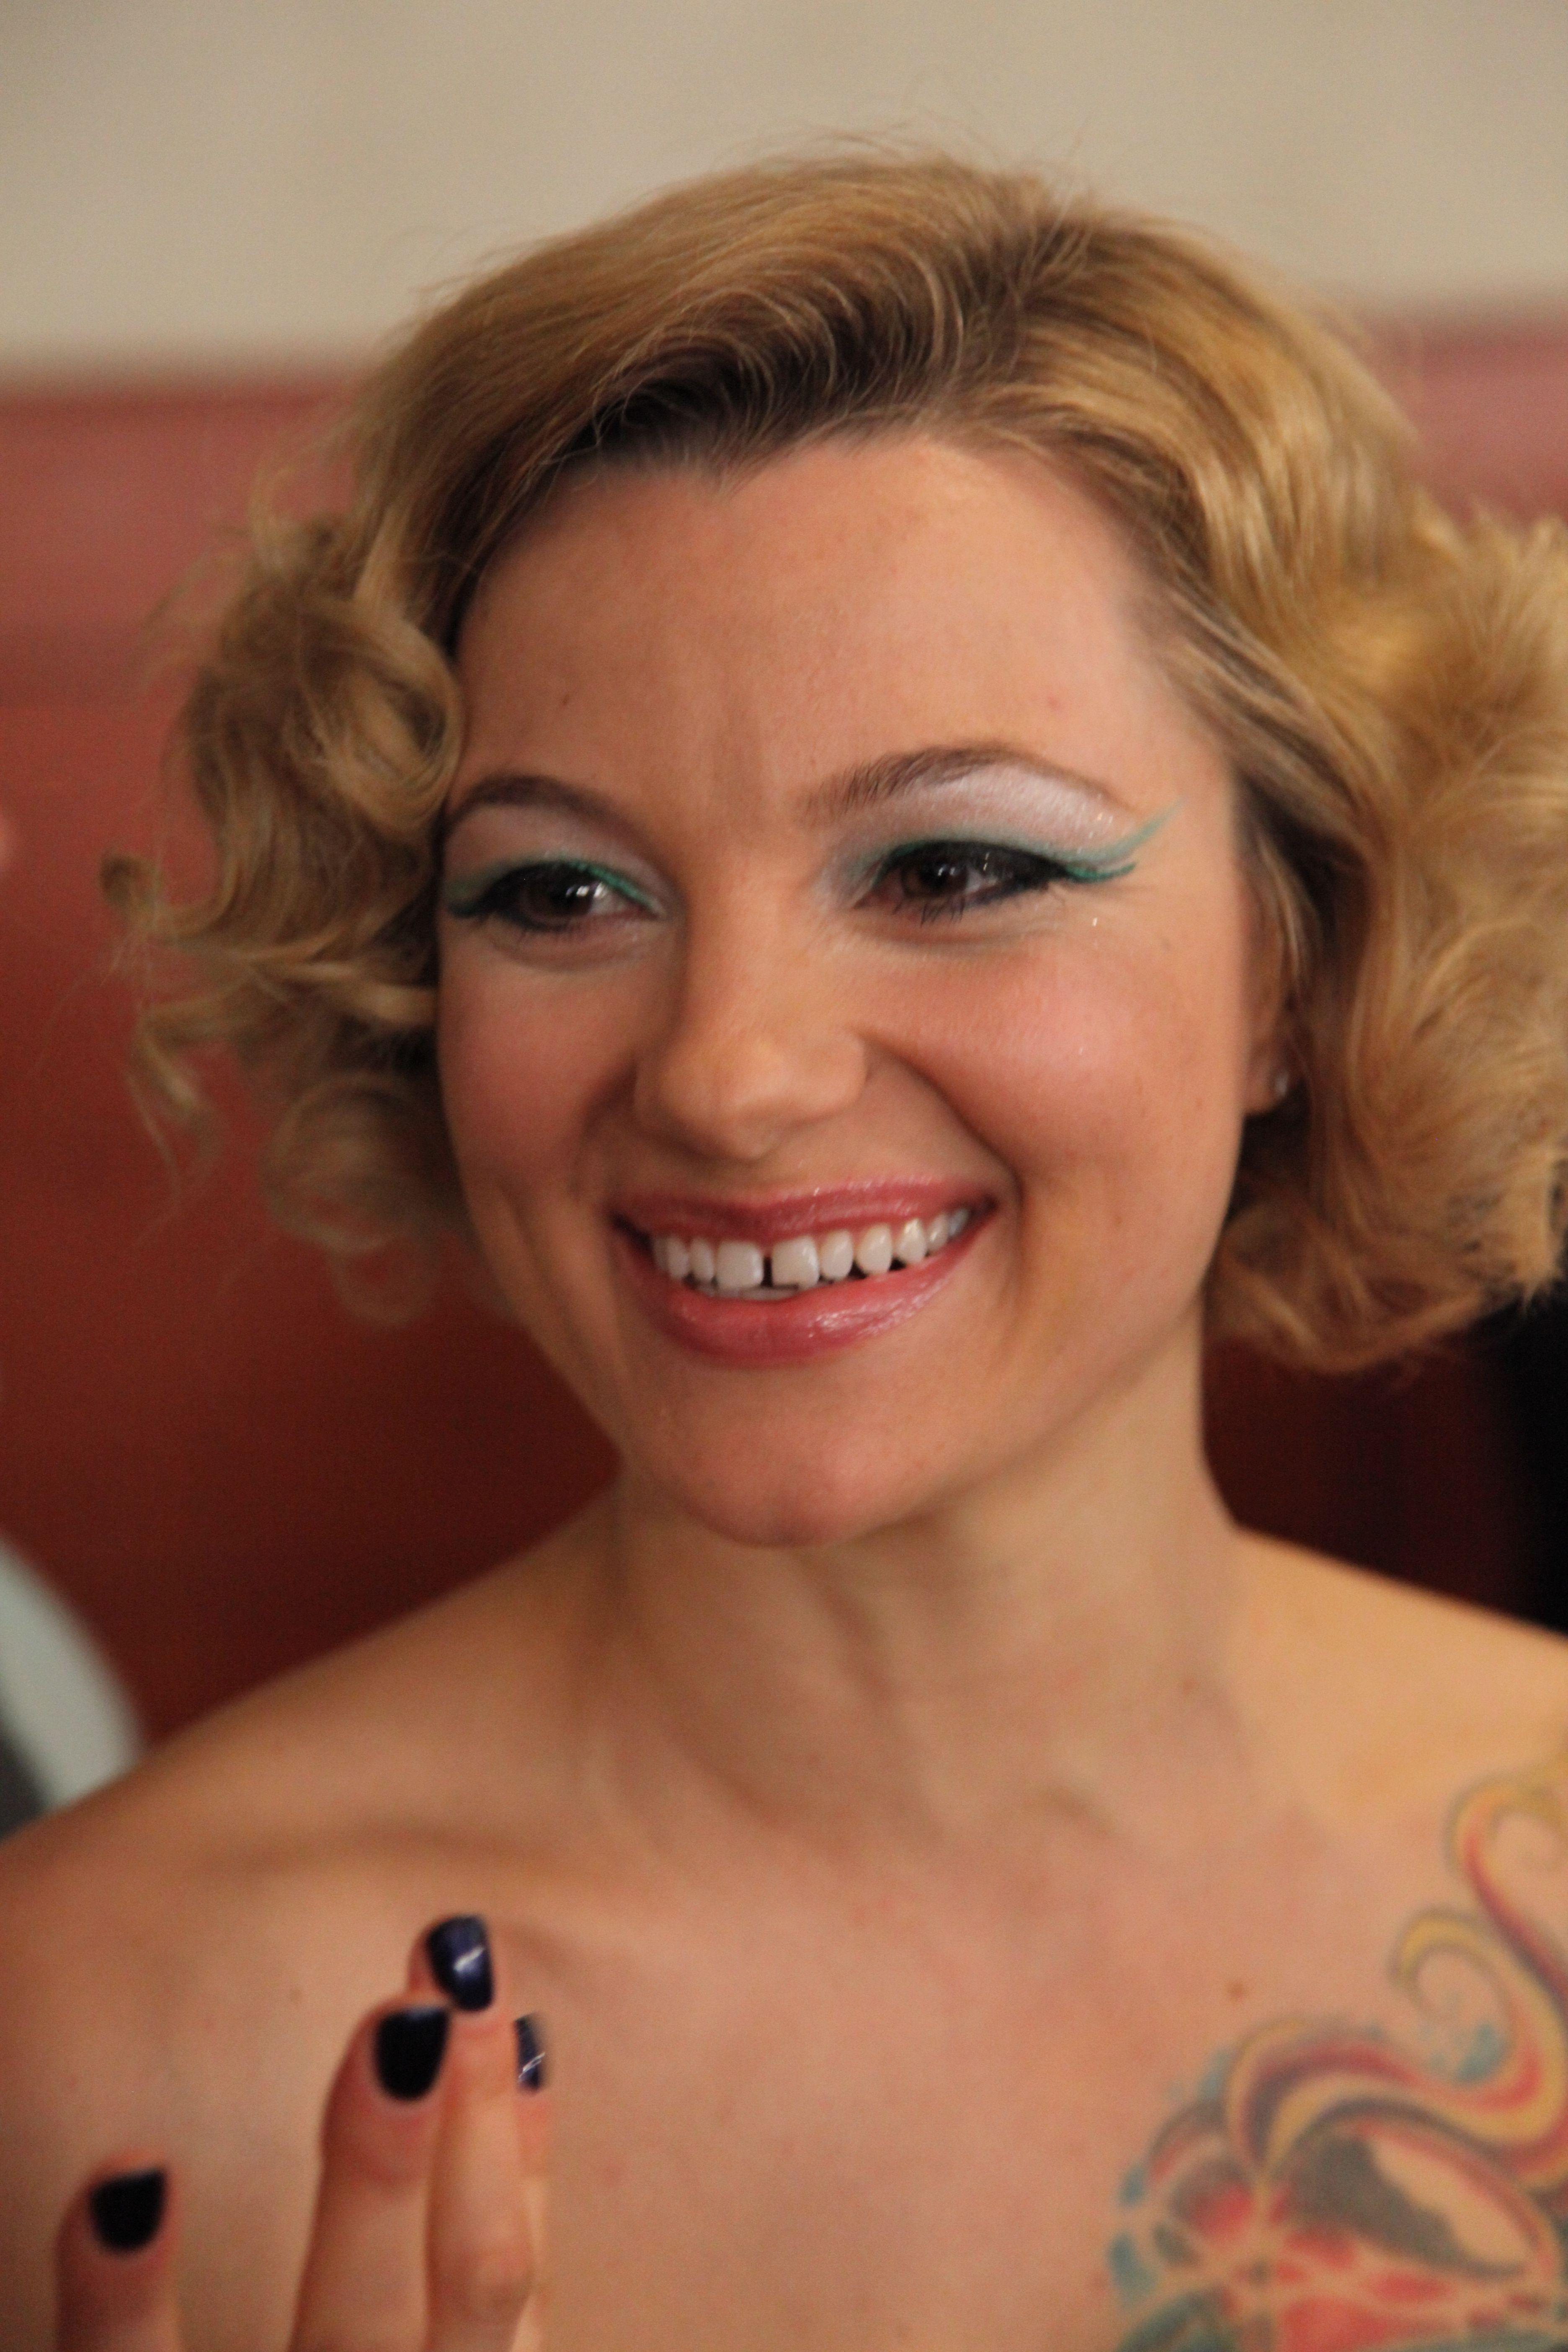 debyut-aktrisi-belladonni-porno-v-uou-tuve